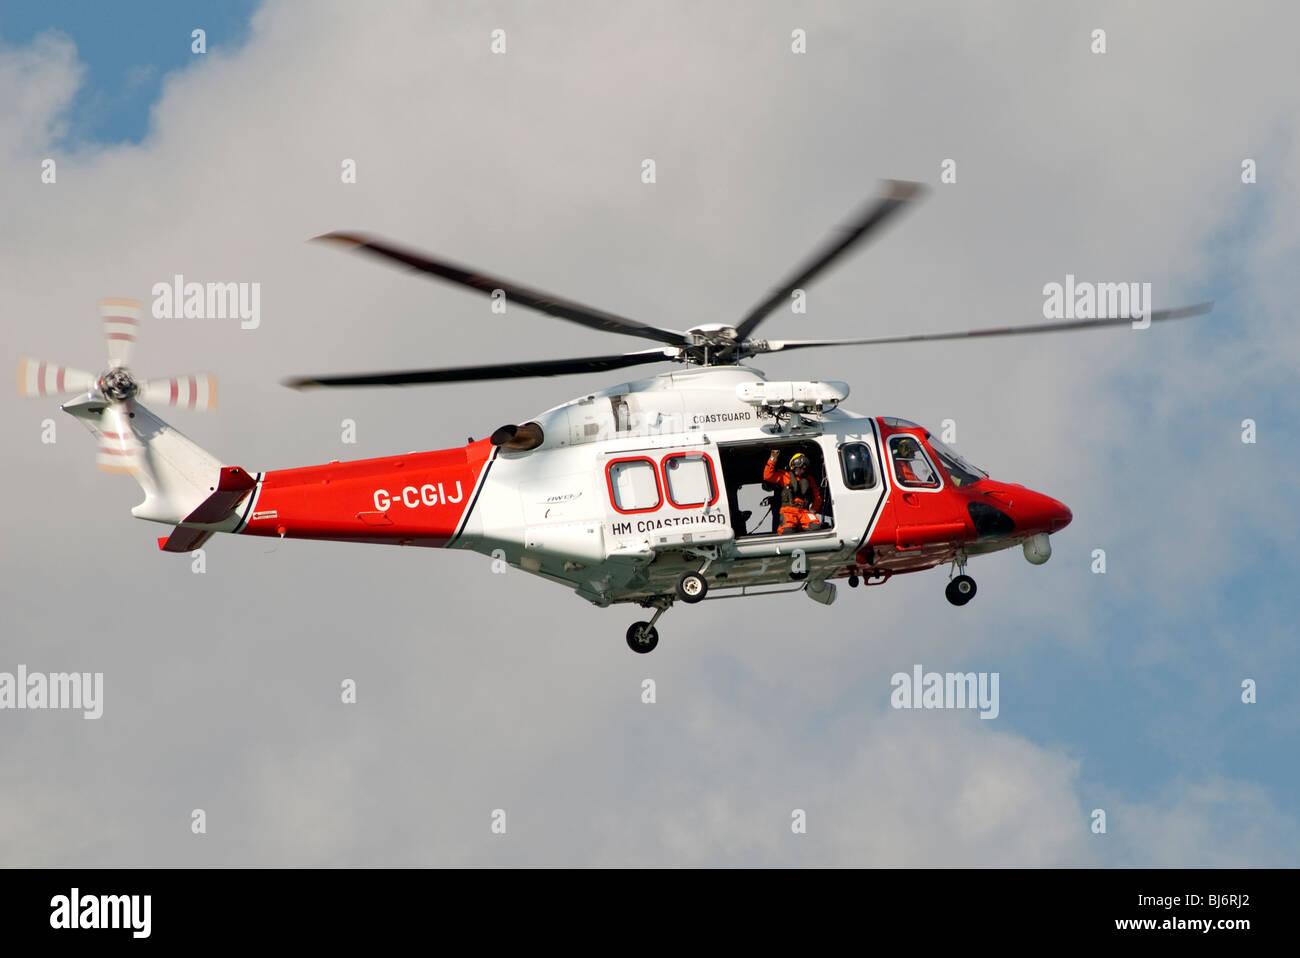 coast guard helicopter Stock Photo: 28424426 - Alamy